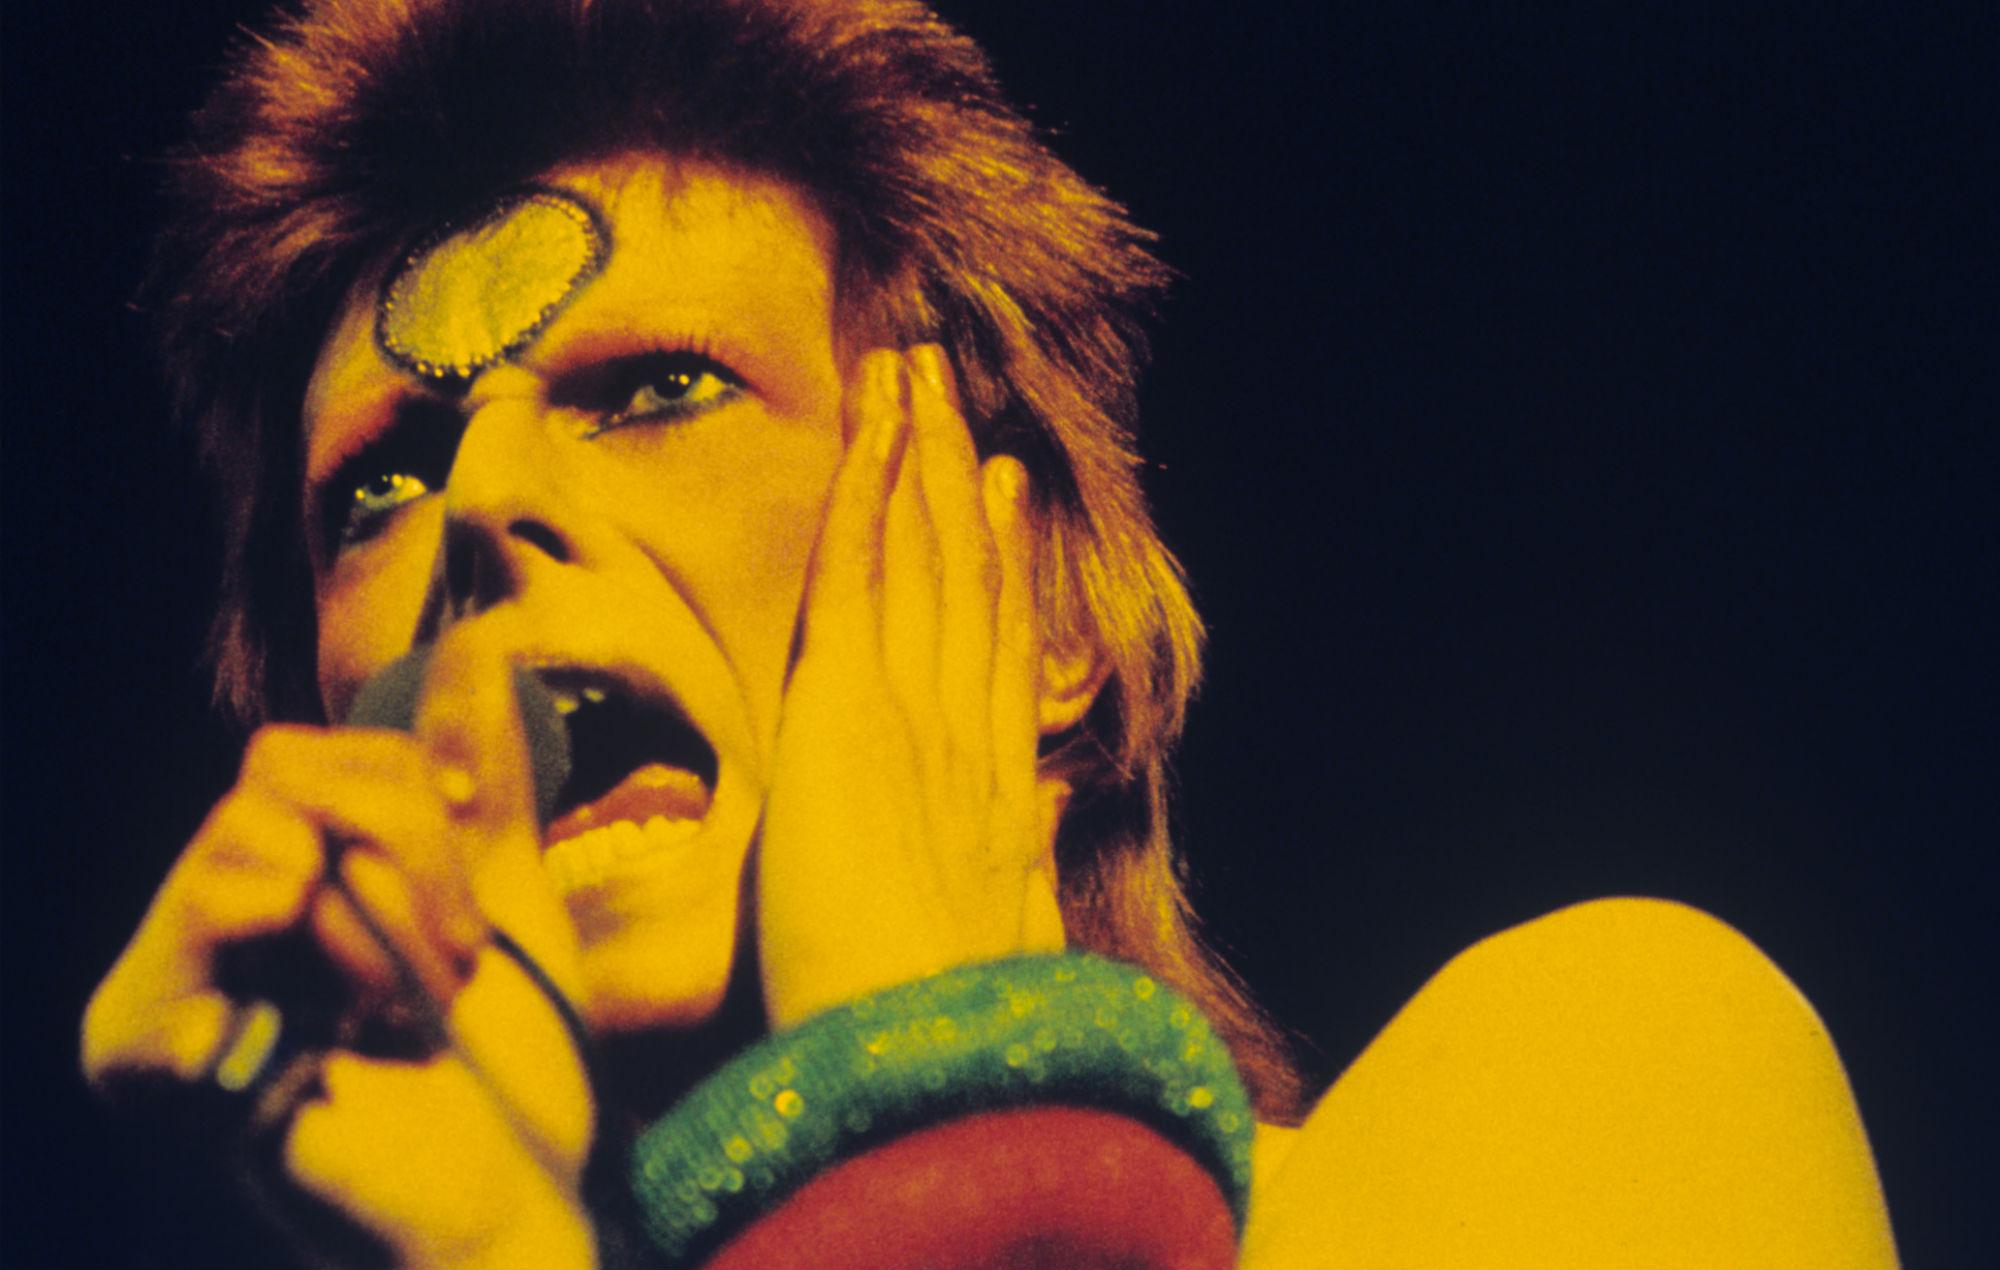 Vans' limited edition David Bowie sneaker range drops this week